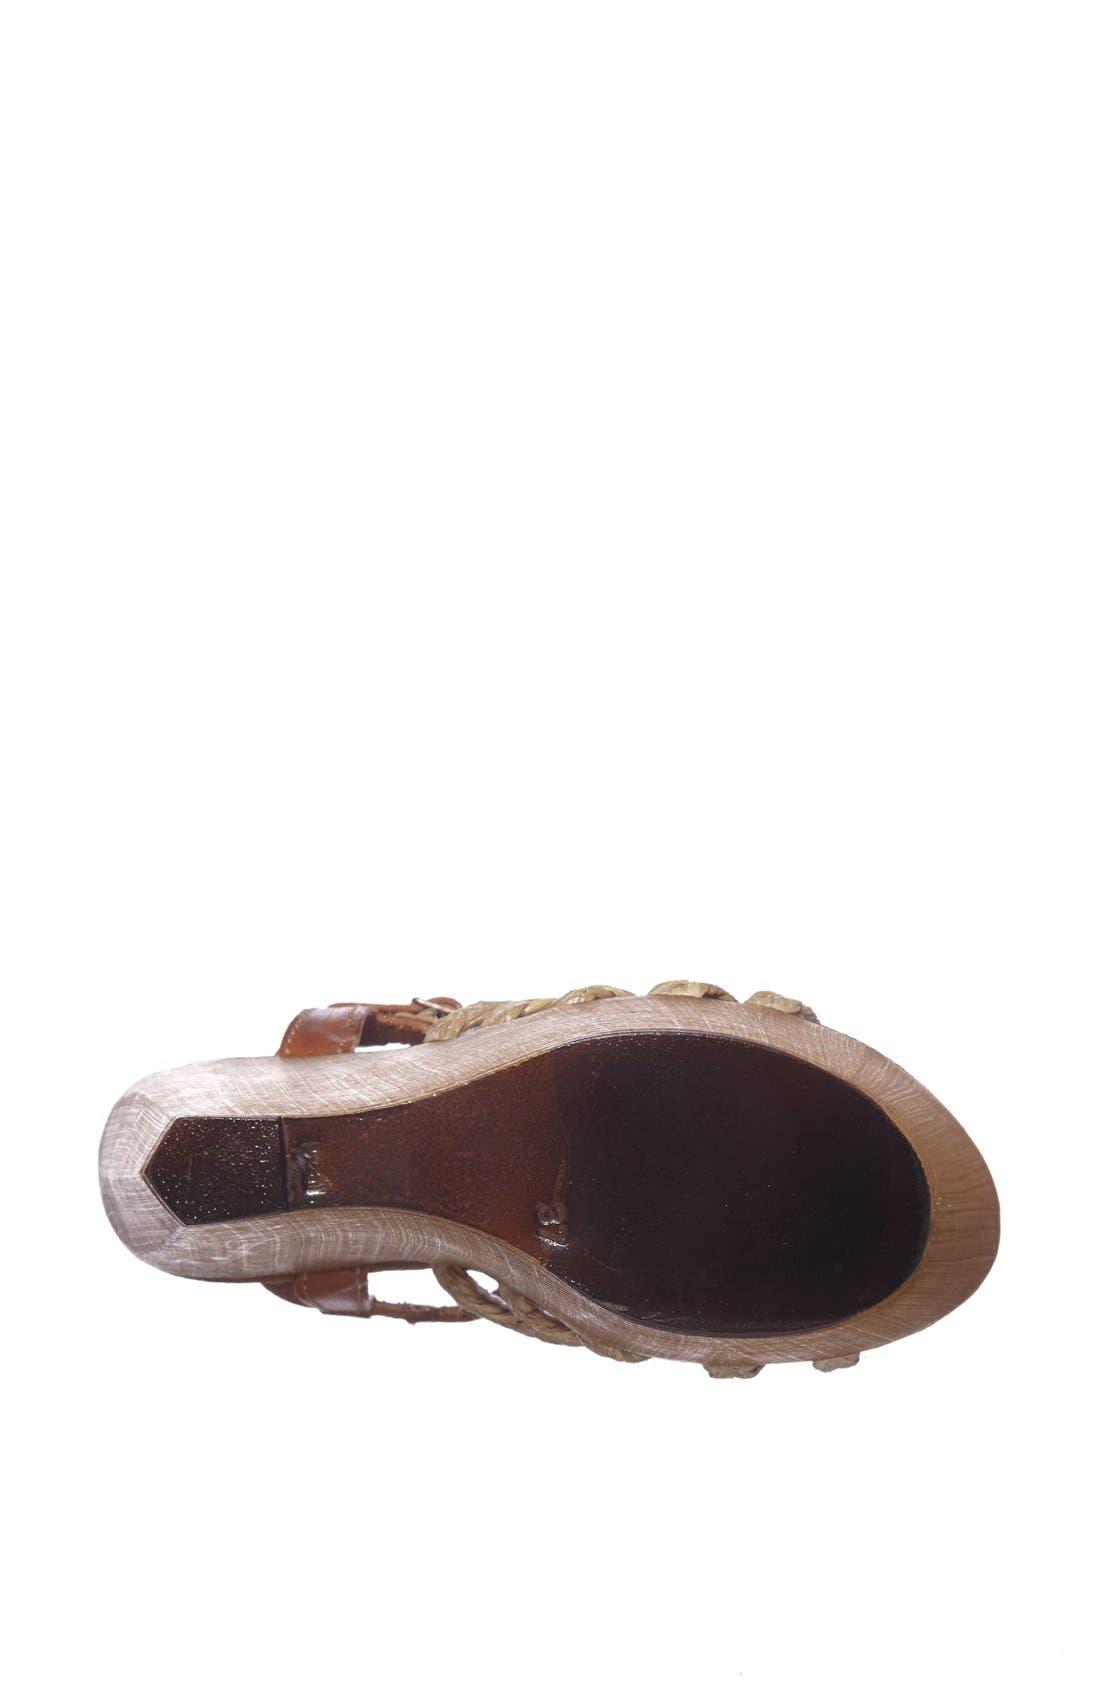 Alternate Image 4  - Sbicca 'Bimini' Wedge Sandal